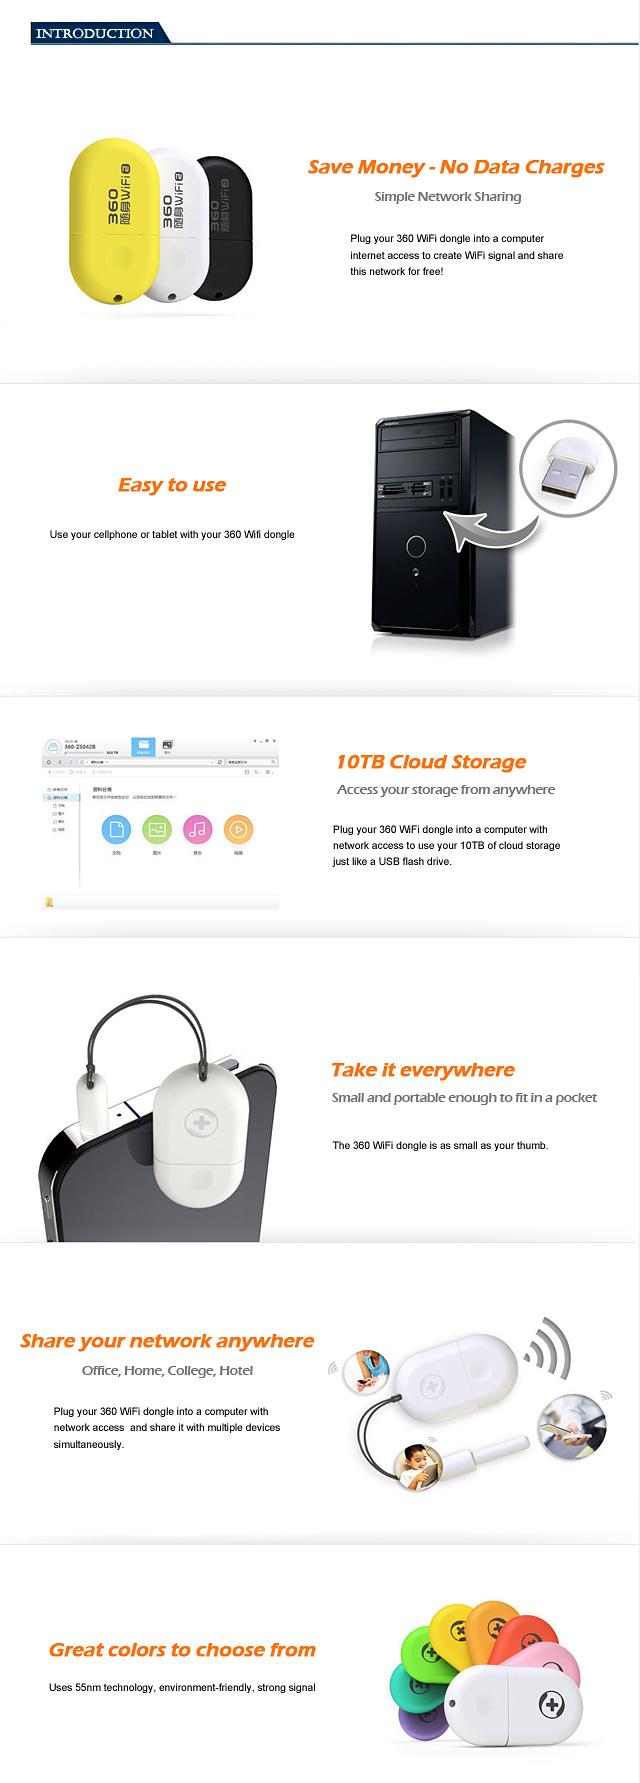 360 WiFi 2 Mini Wireless Router 360 Portable WiFi Adapter luxury Settings Super Easy 150KBS Computer Network